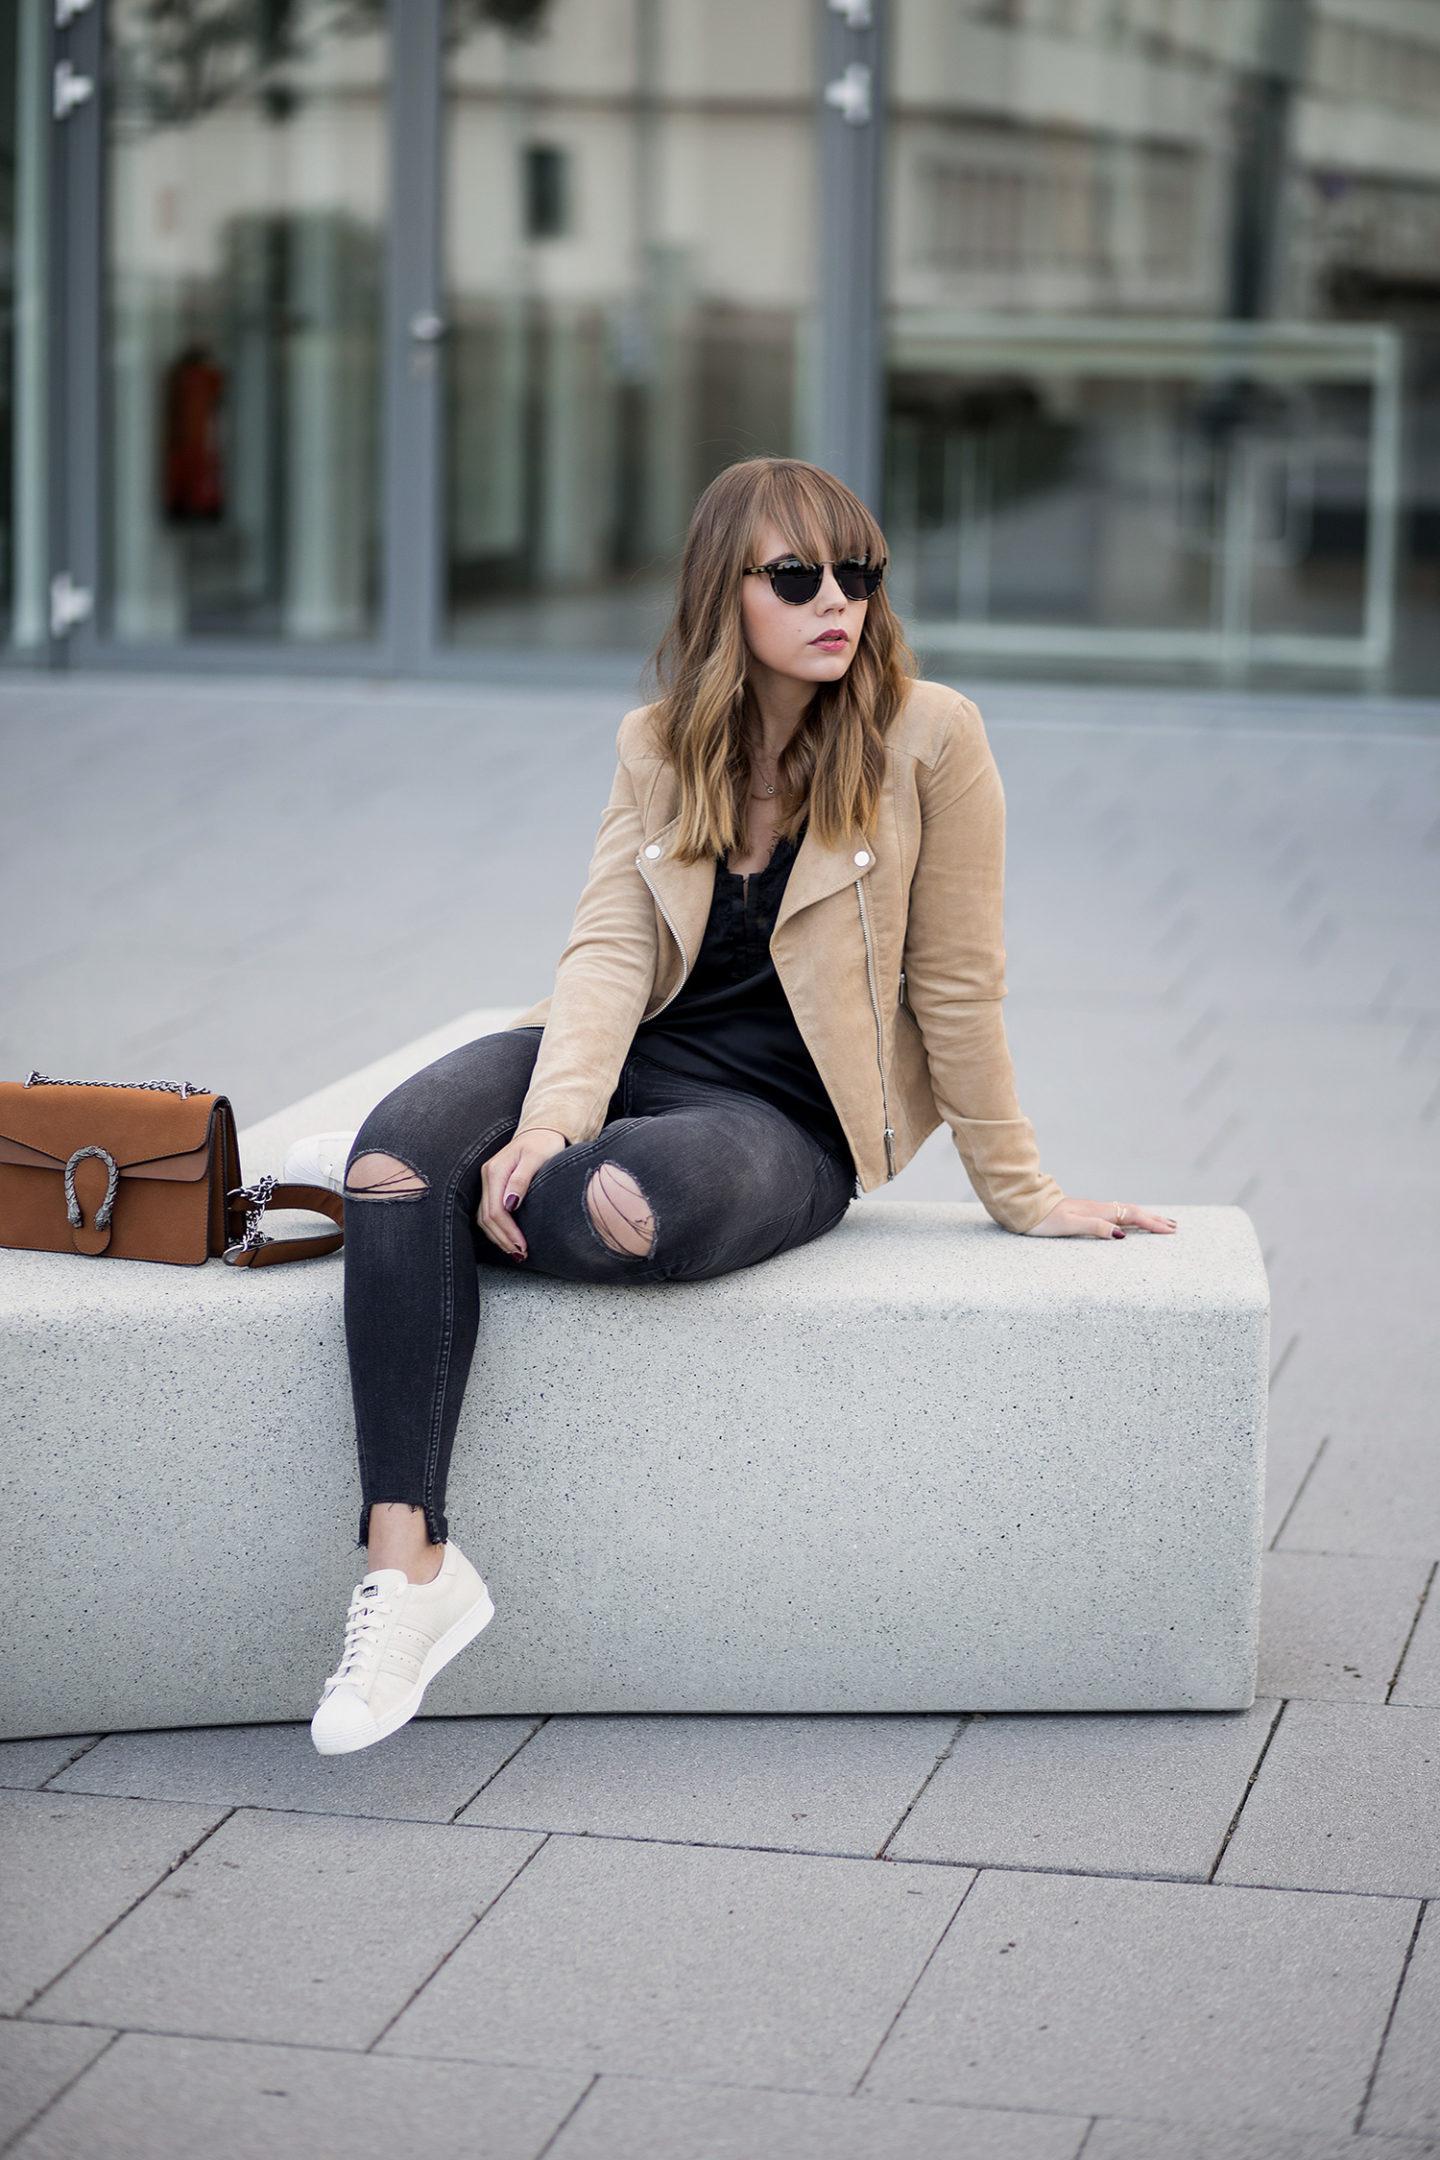 schwarz-und-braun-kombinieren-outfit-lingerie-top-wildlederjacke-adidas-superstars-gucci-dionysus-lookalike-streetstyle-bezauberndenana-1